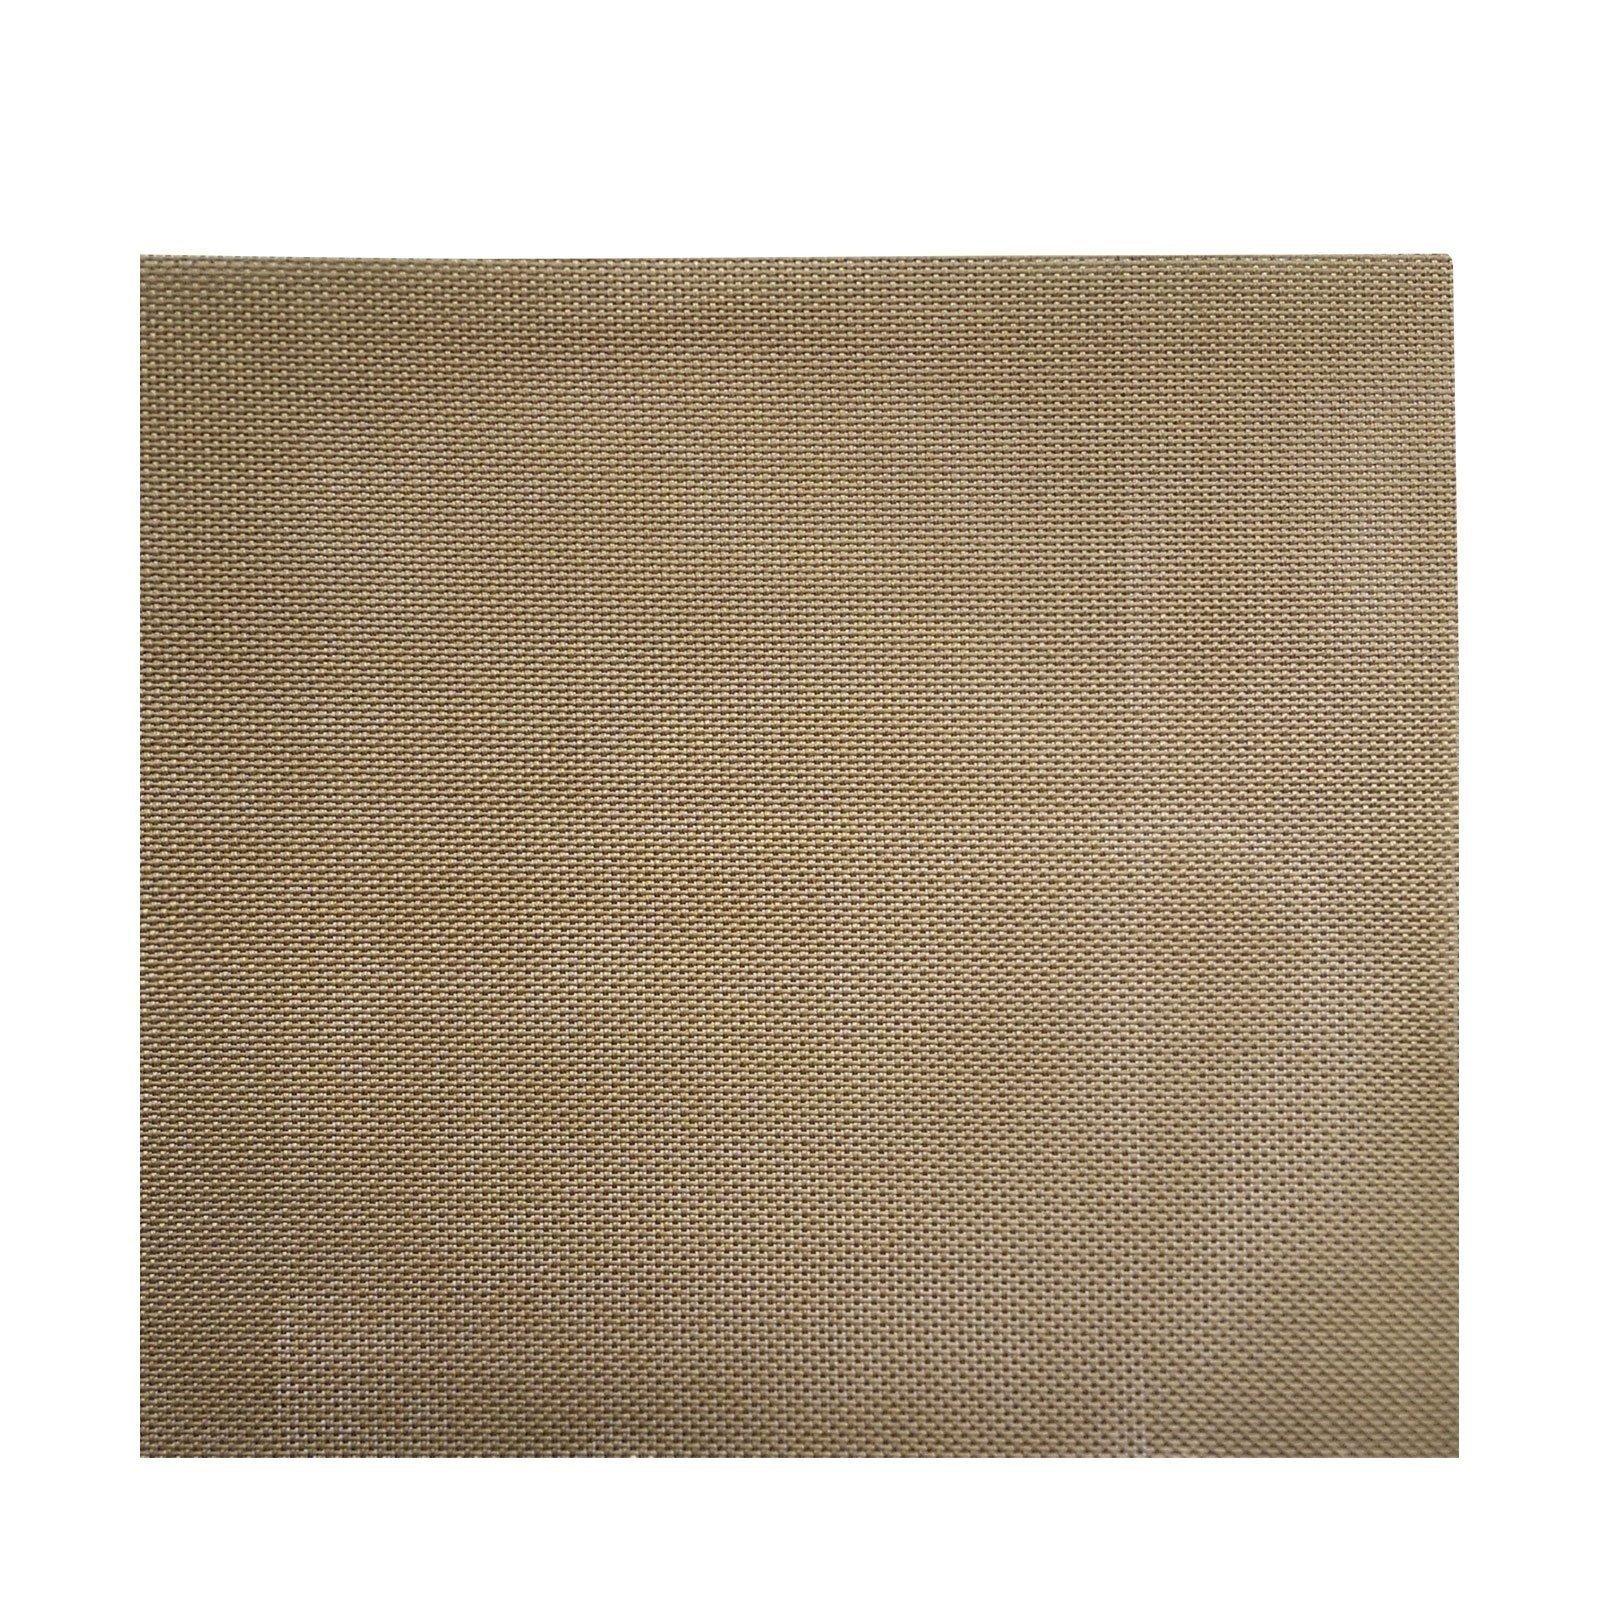 BioChef Arizona 10 Tray Commercial Mesh Sheet - 2 Packs